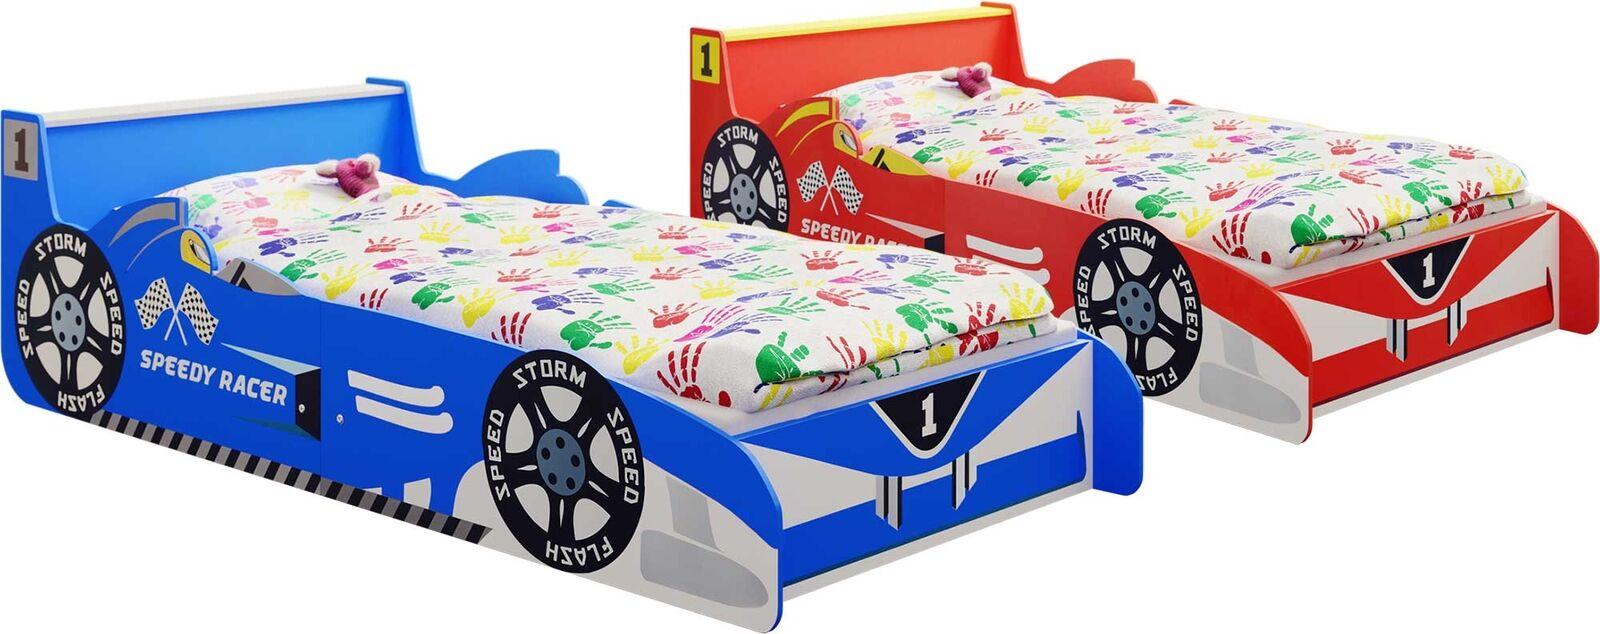 Kinderbett Autobett Speedy Racer Junior 140 x 70 cm blau/rot Rennwagen